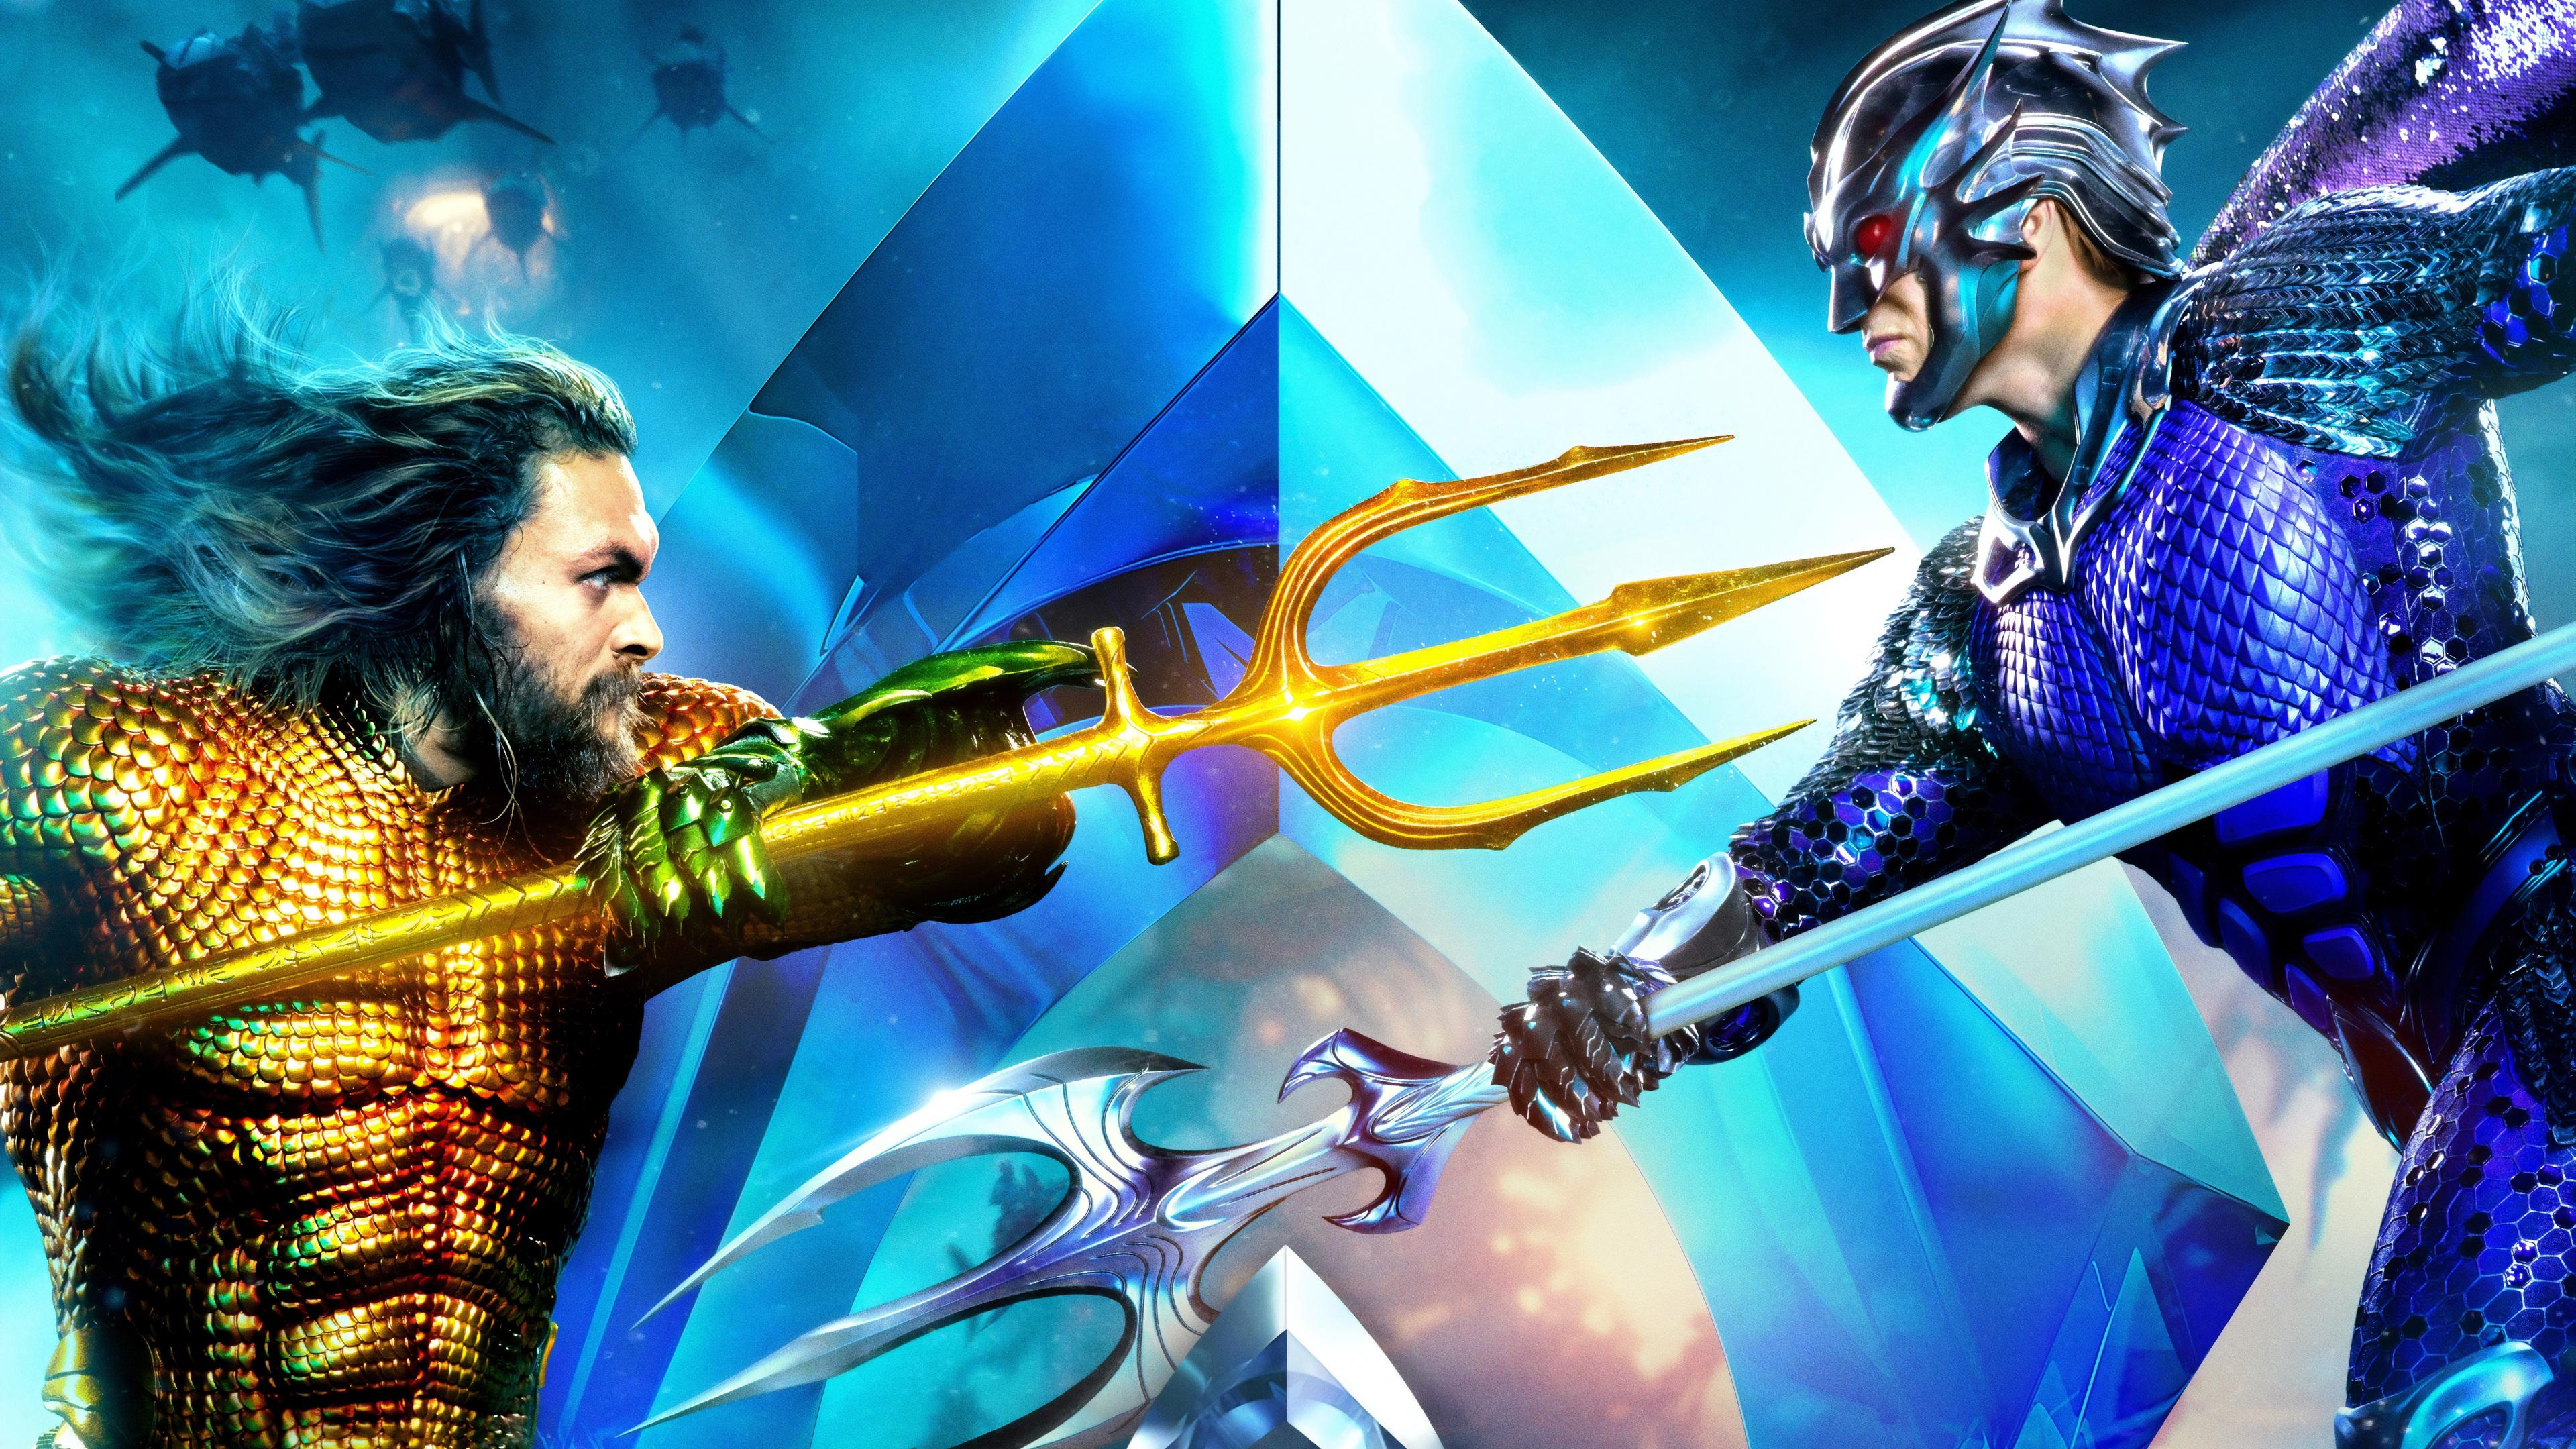 Aquaman 2018 Movie 4k Wallpapers: Aquaman And Ocean Master International Poster 4k Poster